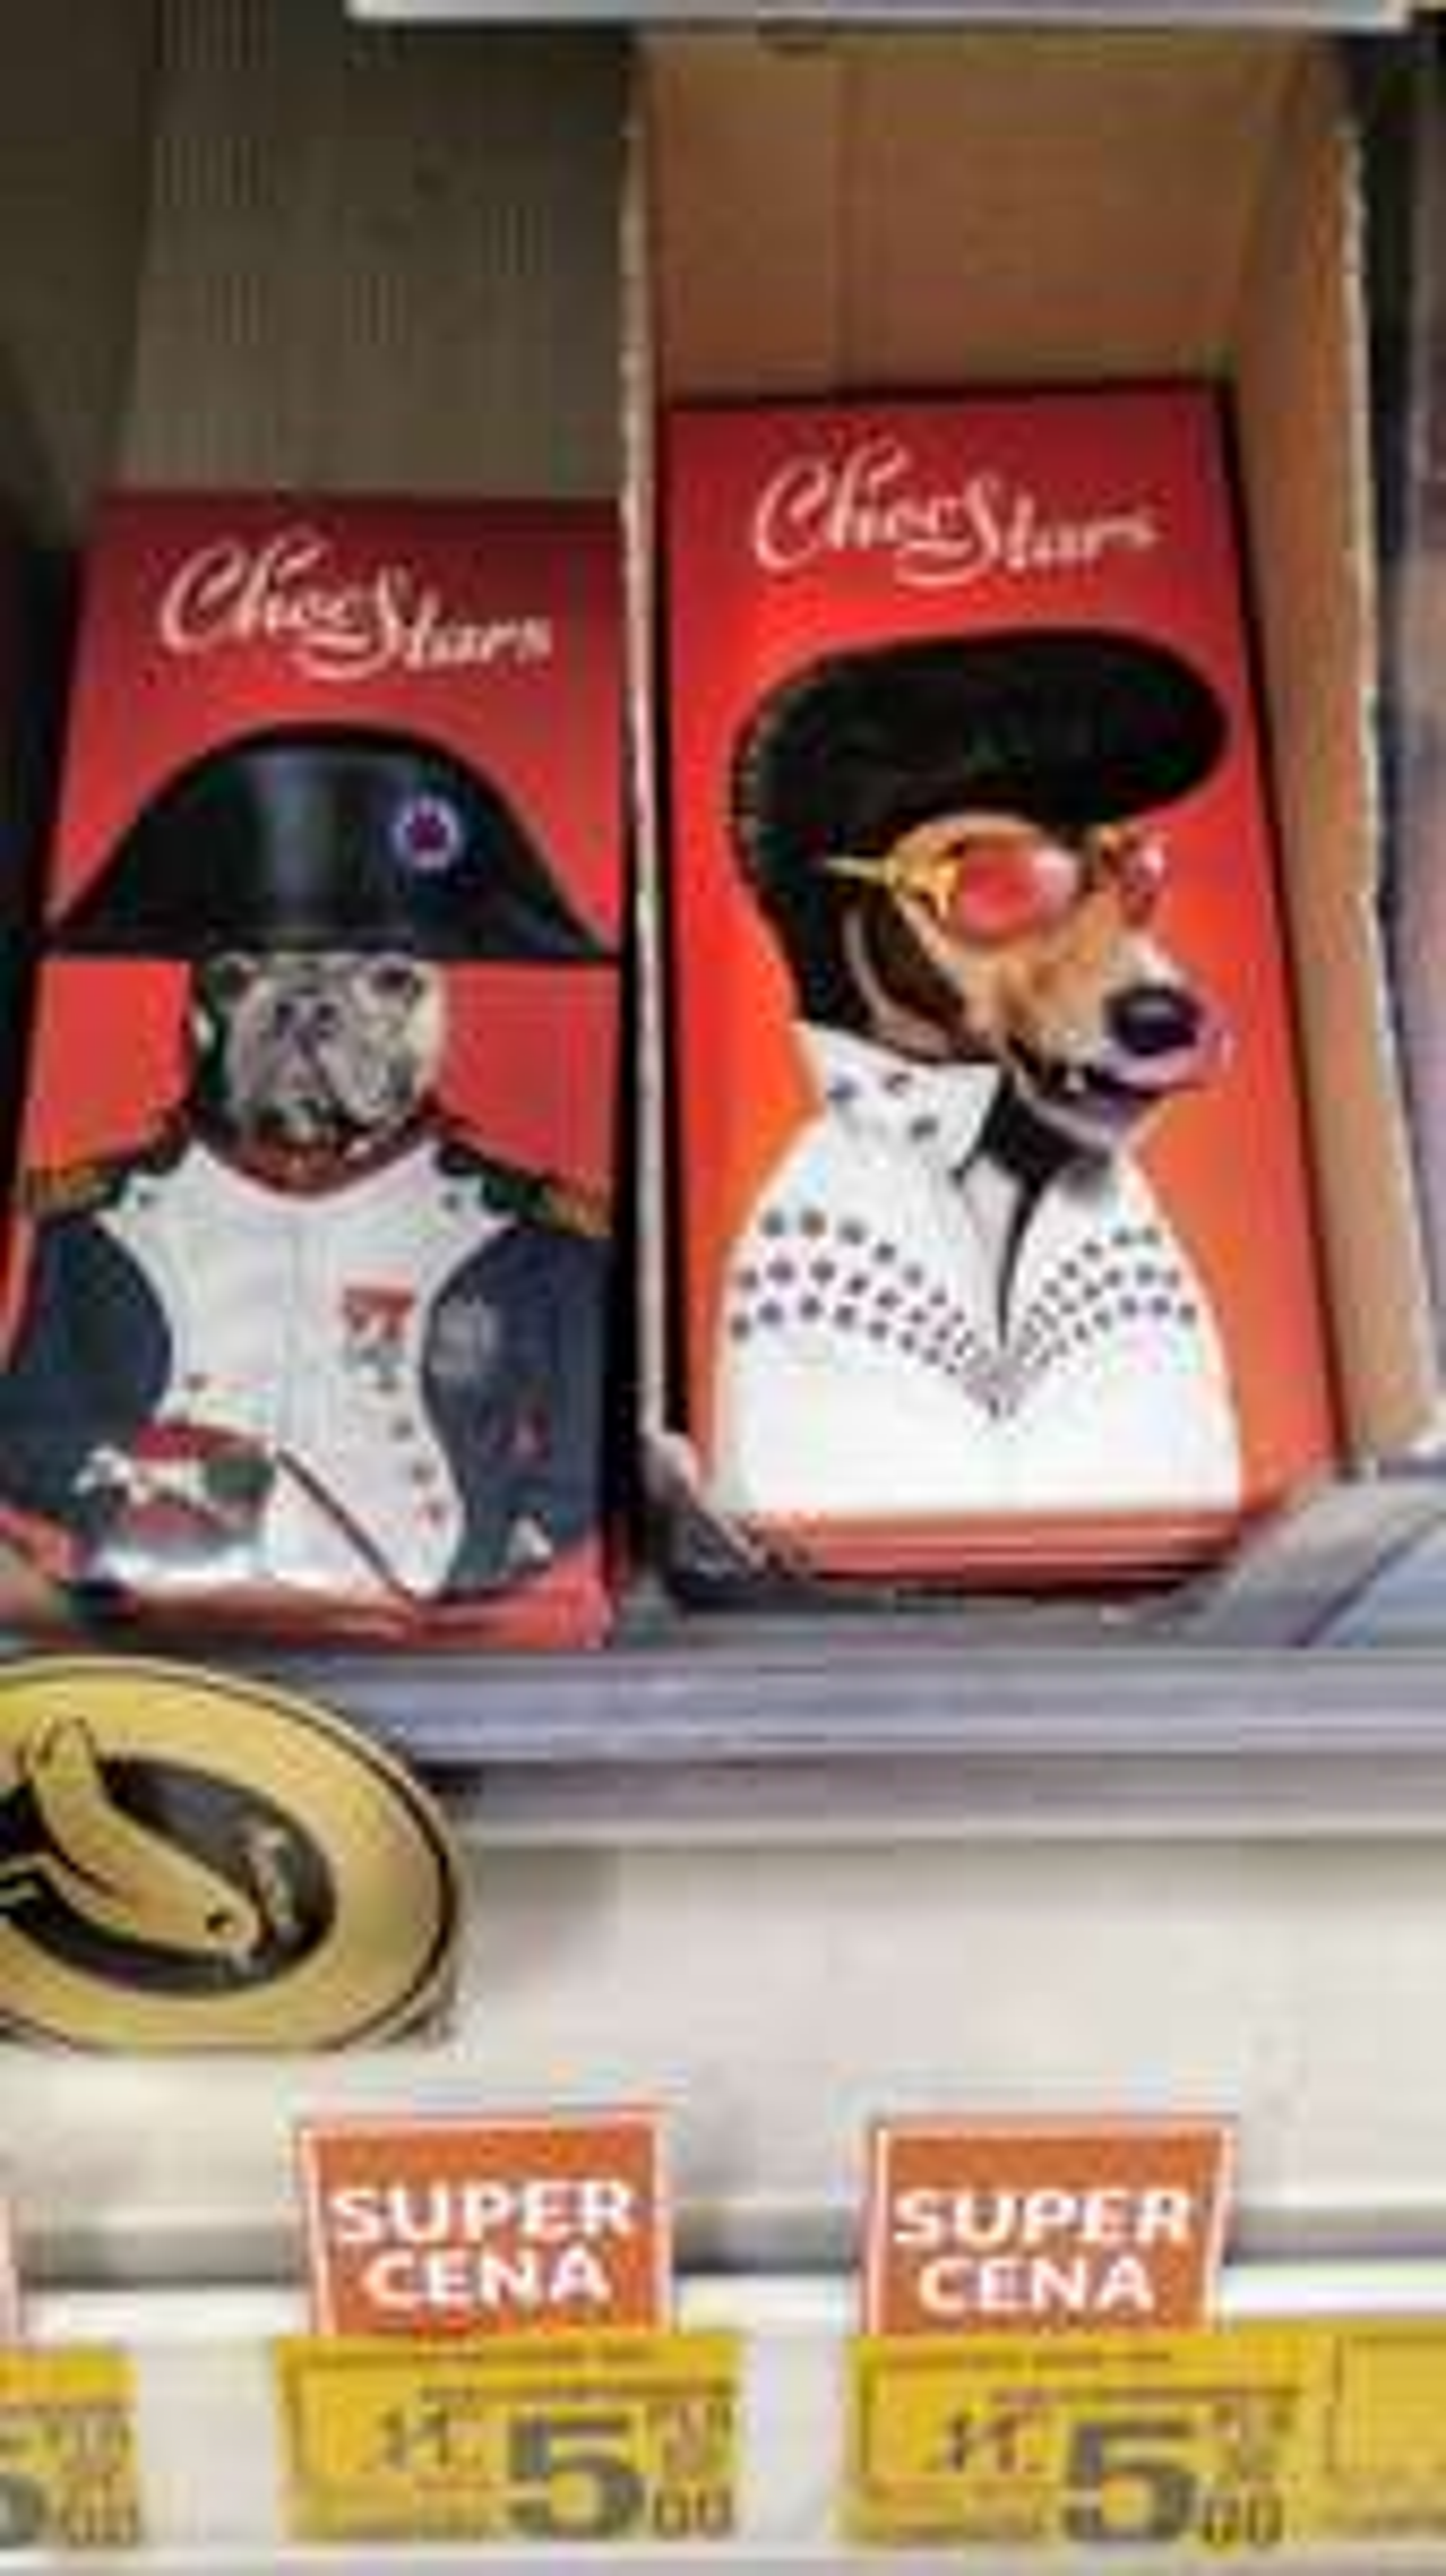 Czekolada ChocStars Vegas 100 g   Auchan Gliwice  